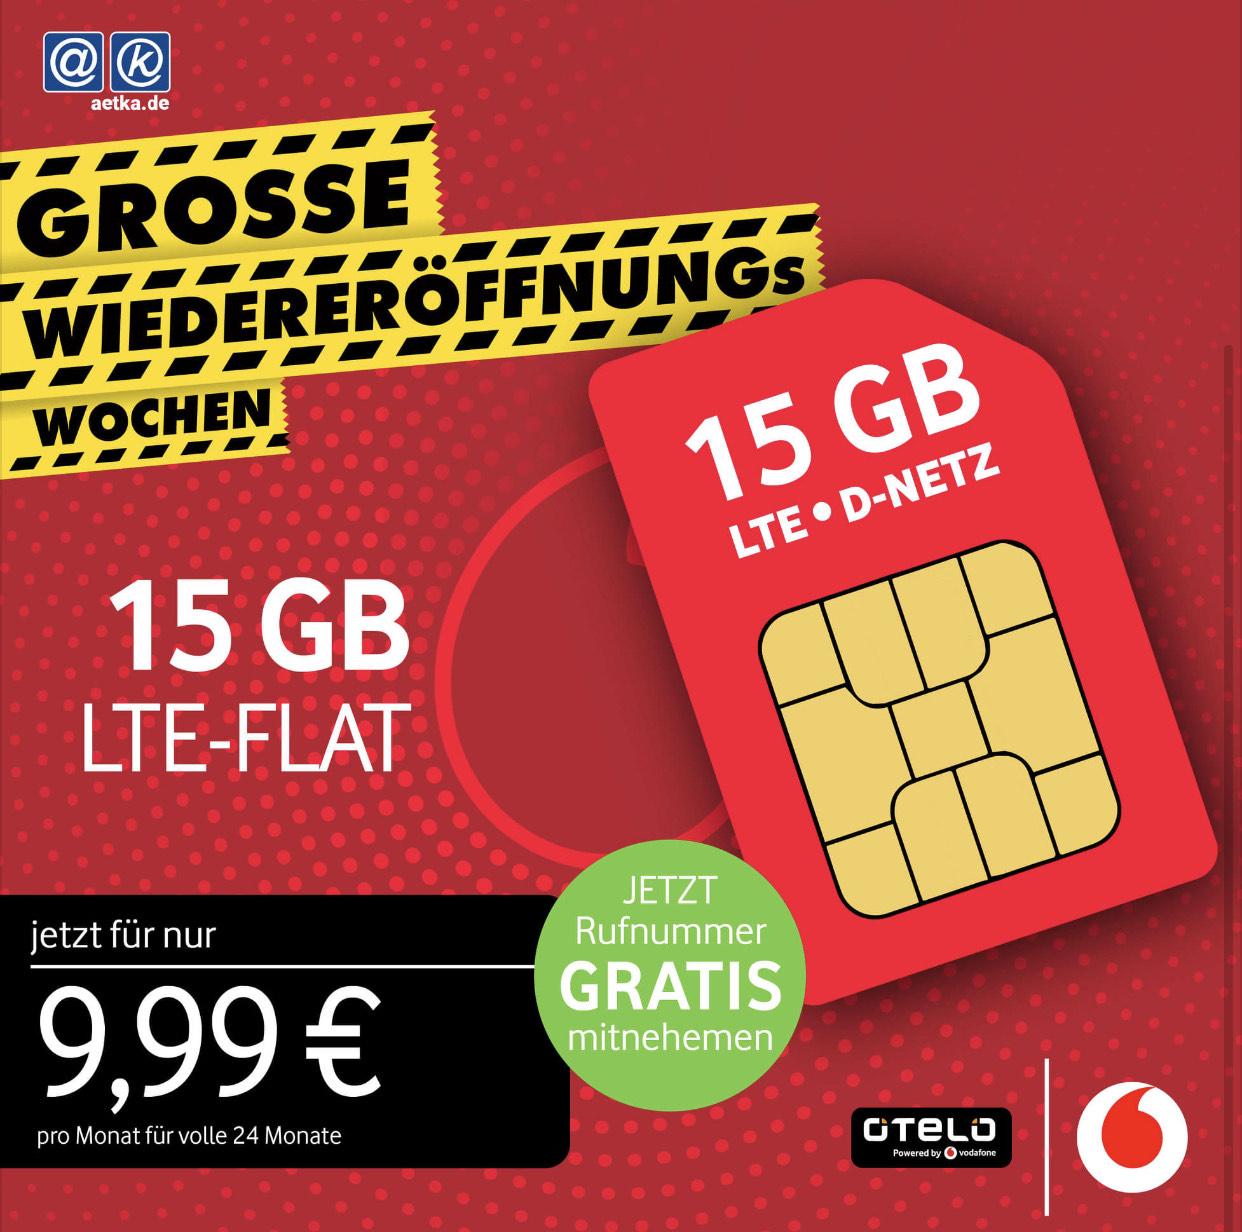 Otelo 15 GB, Allnet-Flat, 24 Monate